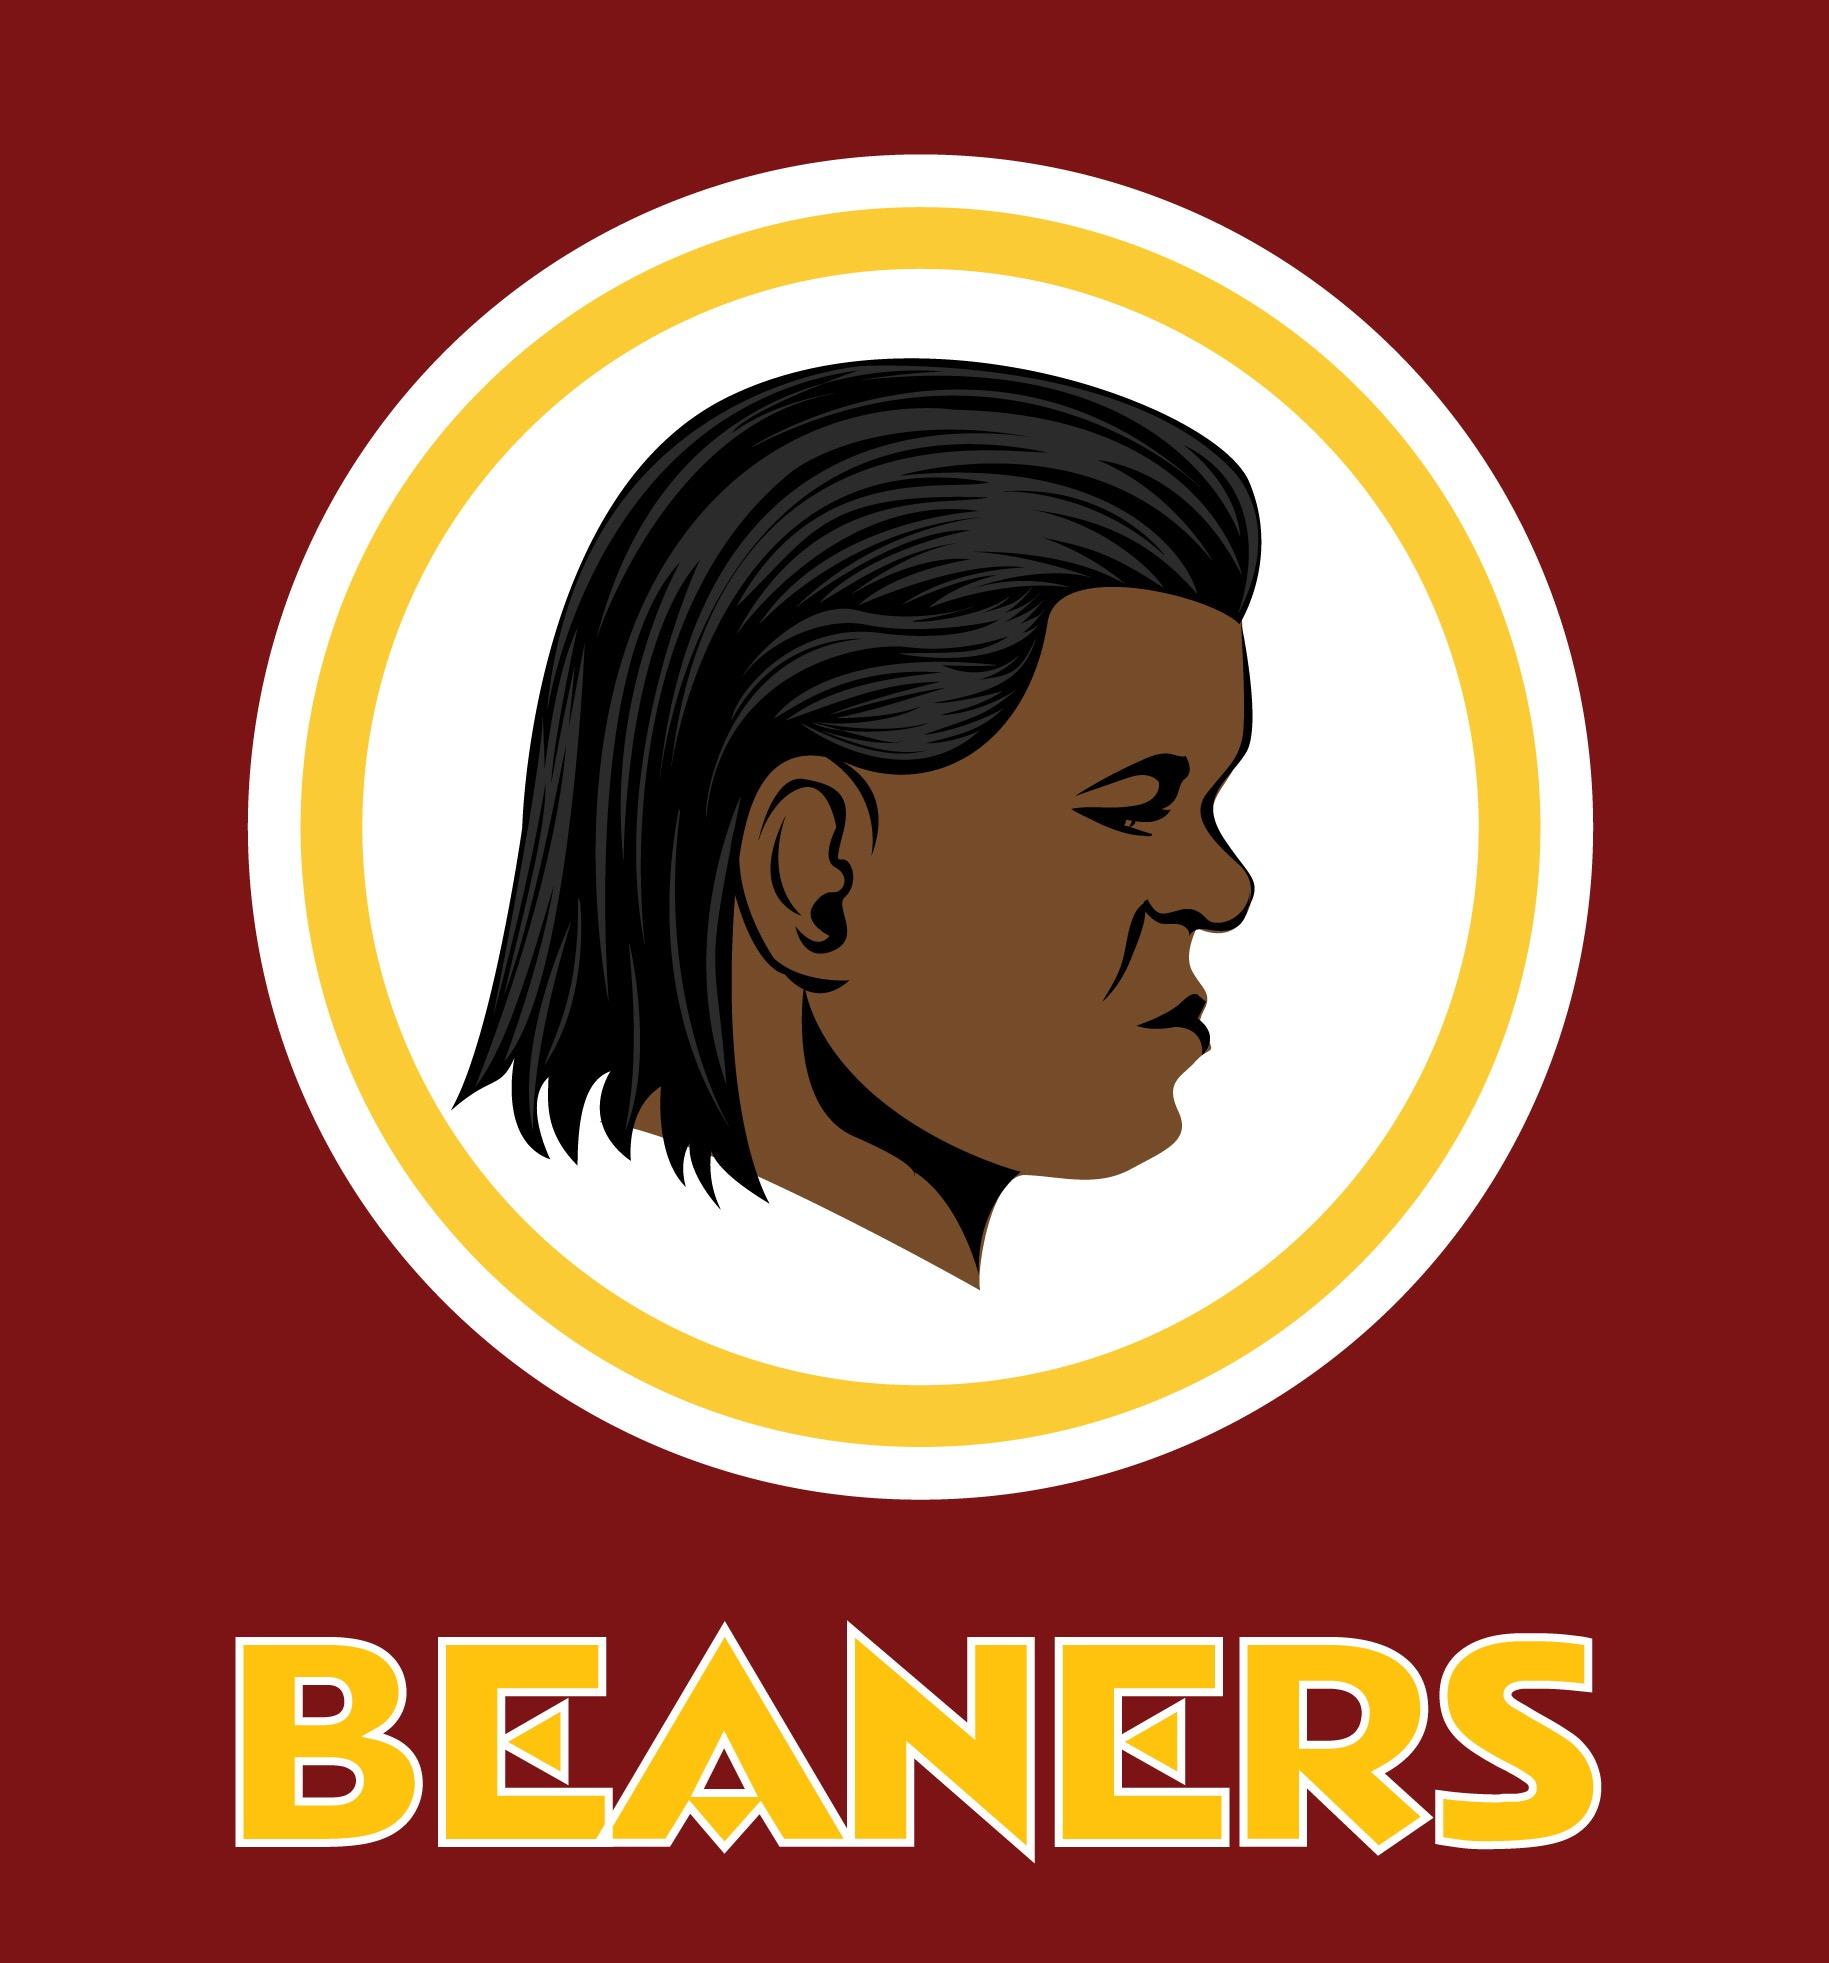 beaners.JPG